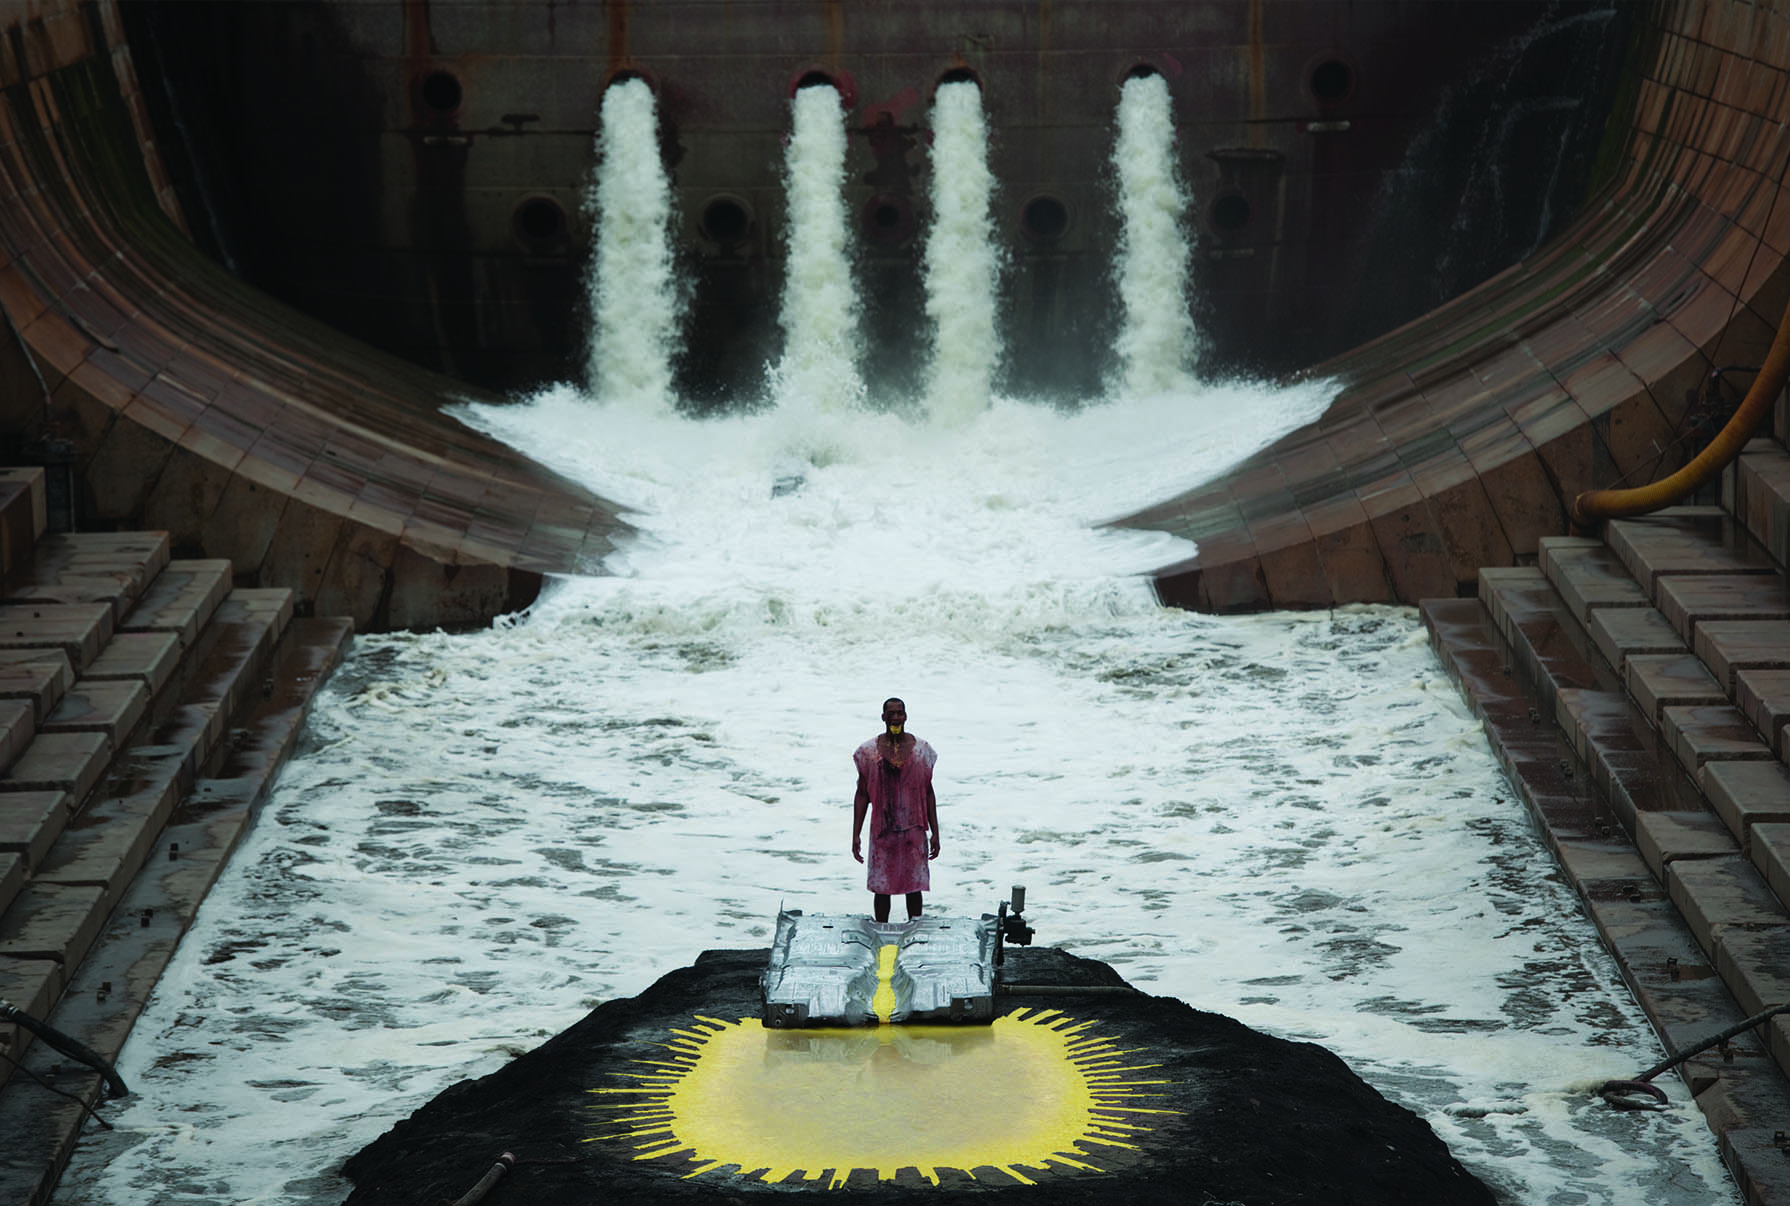 Matthew Barney and Jonathan Bepler Talk River of Fundament on Pitchfork.tv